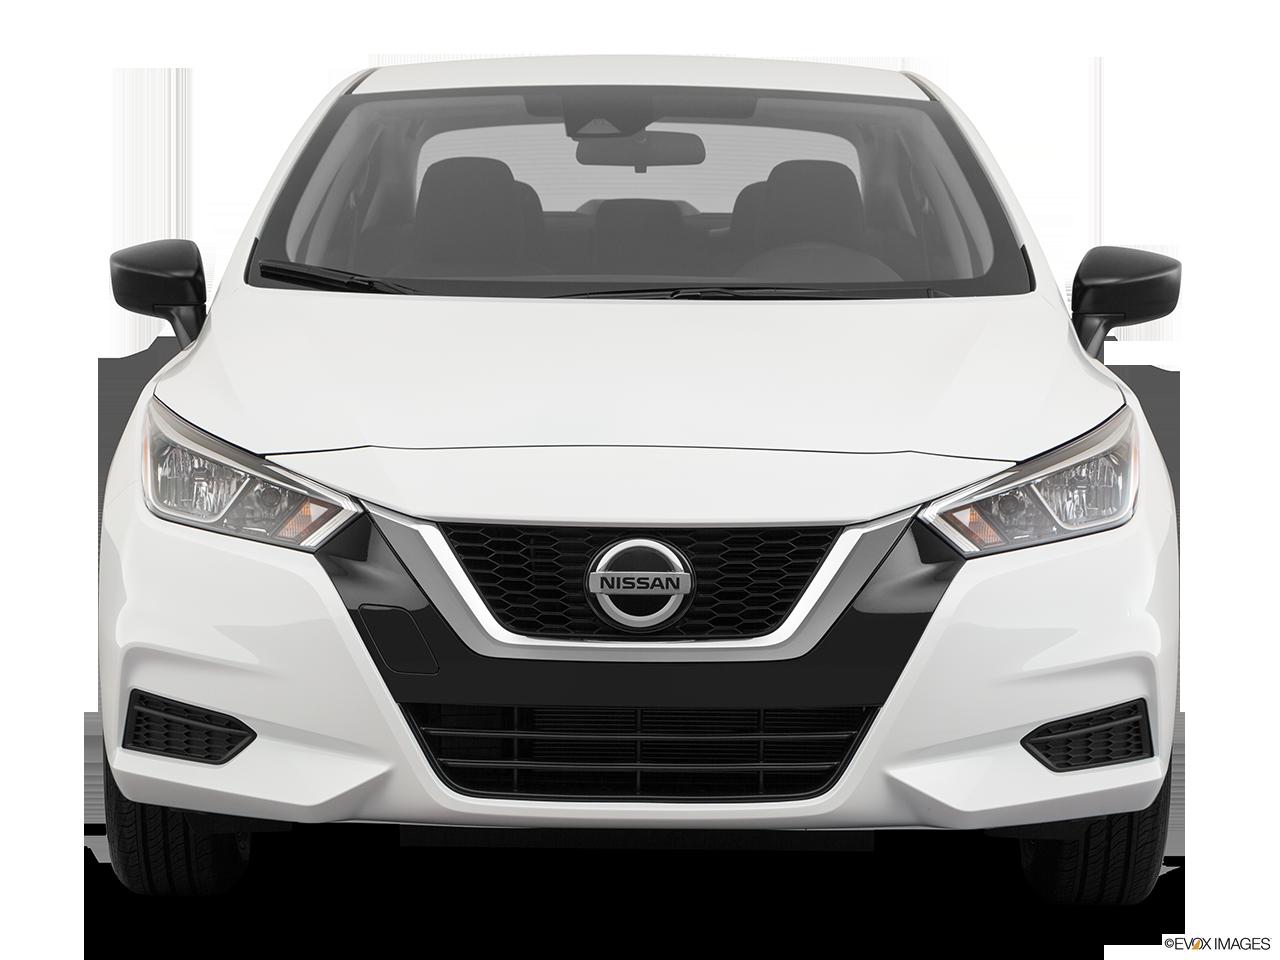 2020 Nissan Versa photo